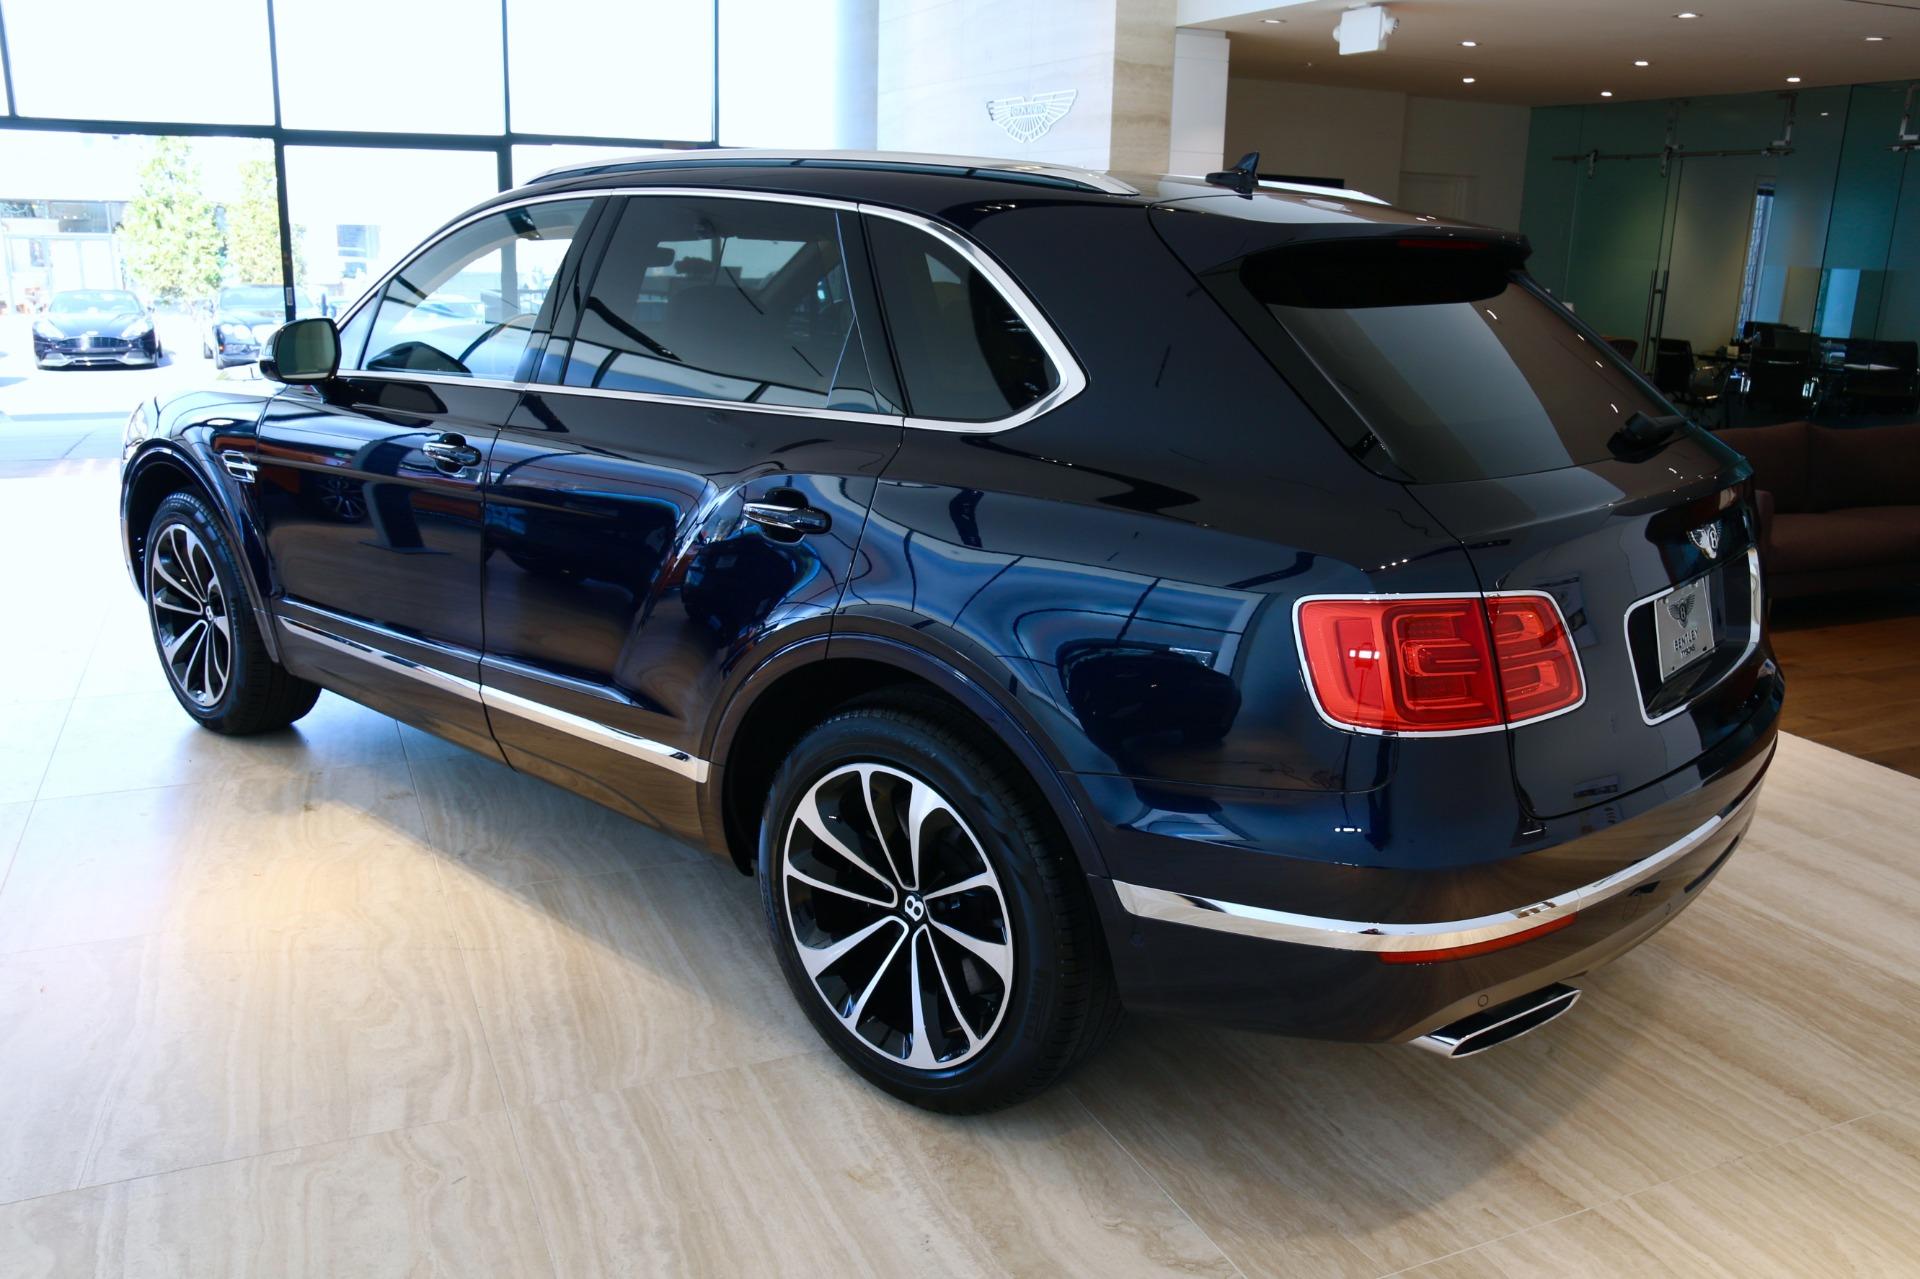 2017 Bentley Bentayga W12 Signature Stock 7nc014376 For Sale Near Vienna Va Va Bentley Dealer